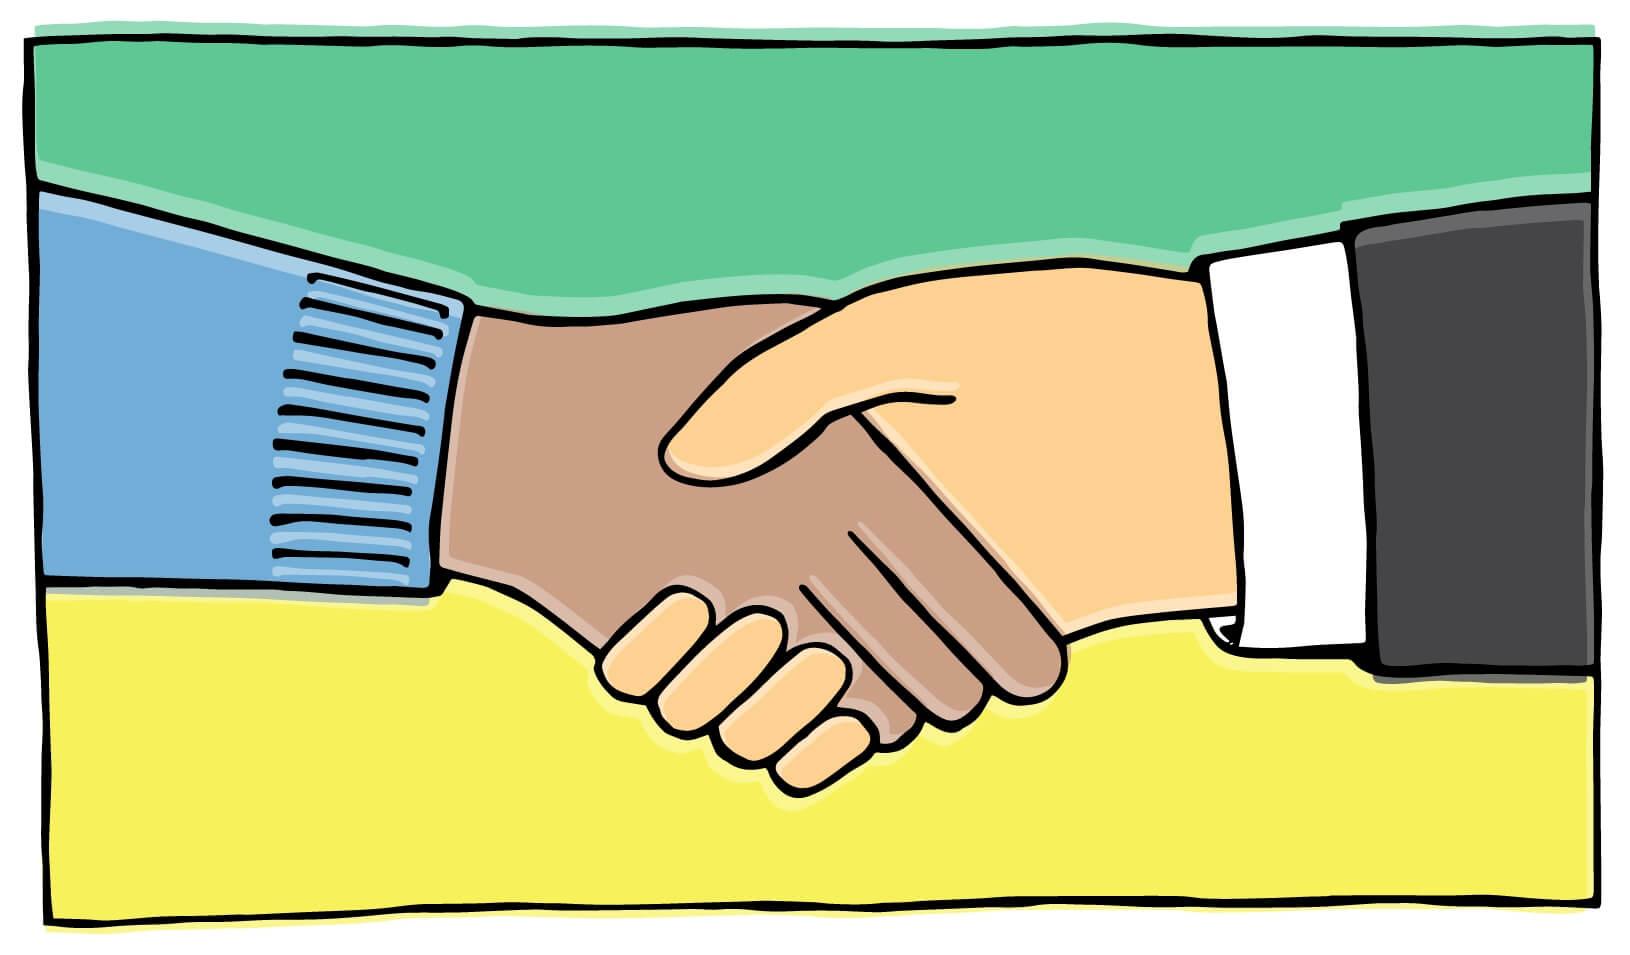 Negotiating an Agreement (2017 Update)